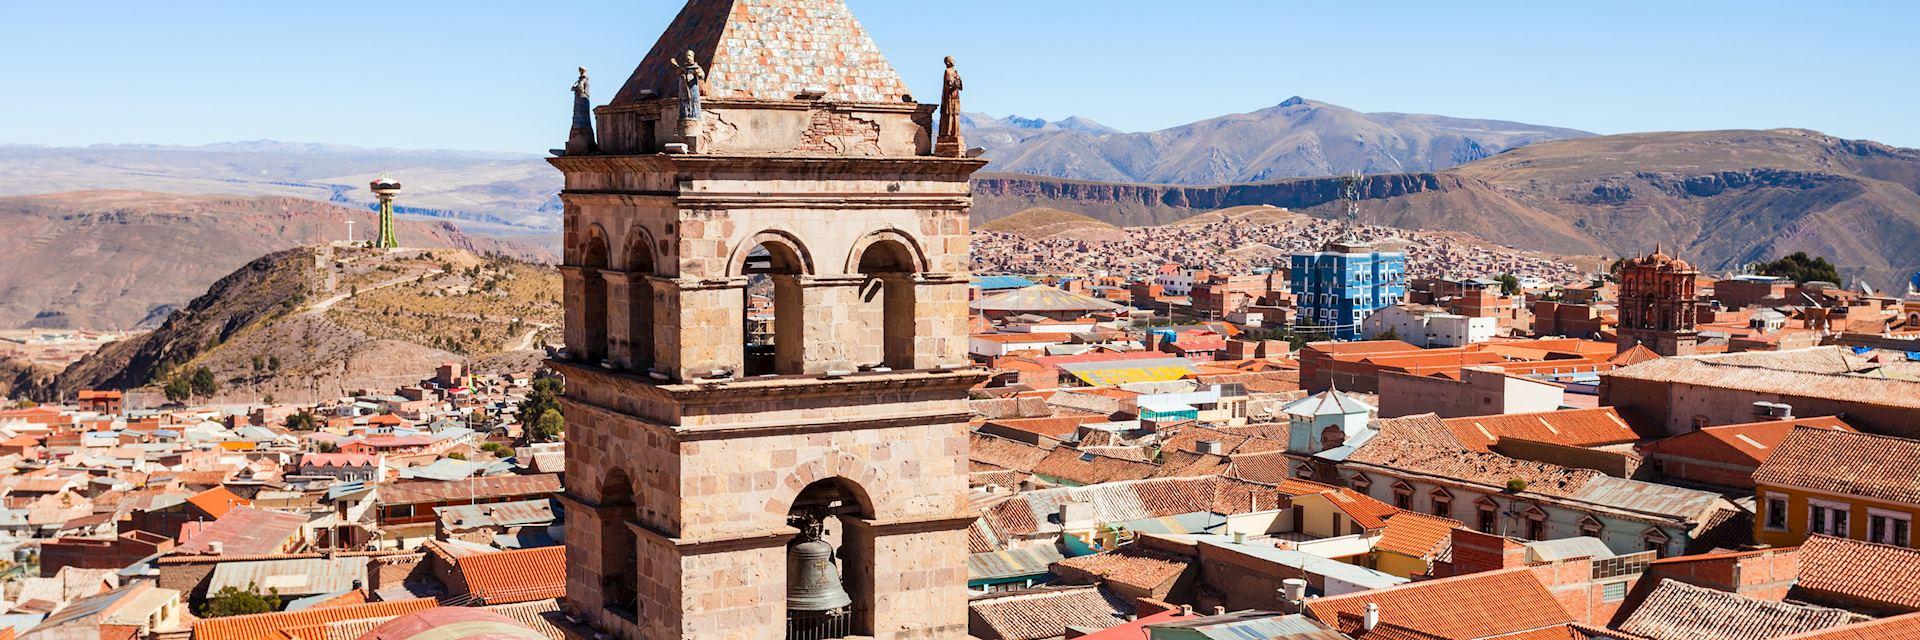 Potosí skyline